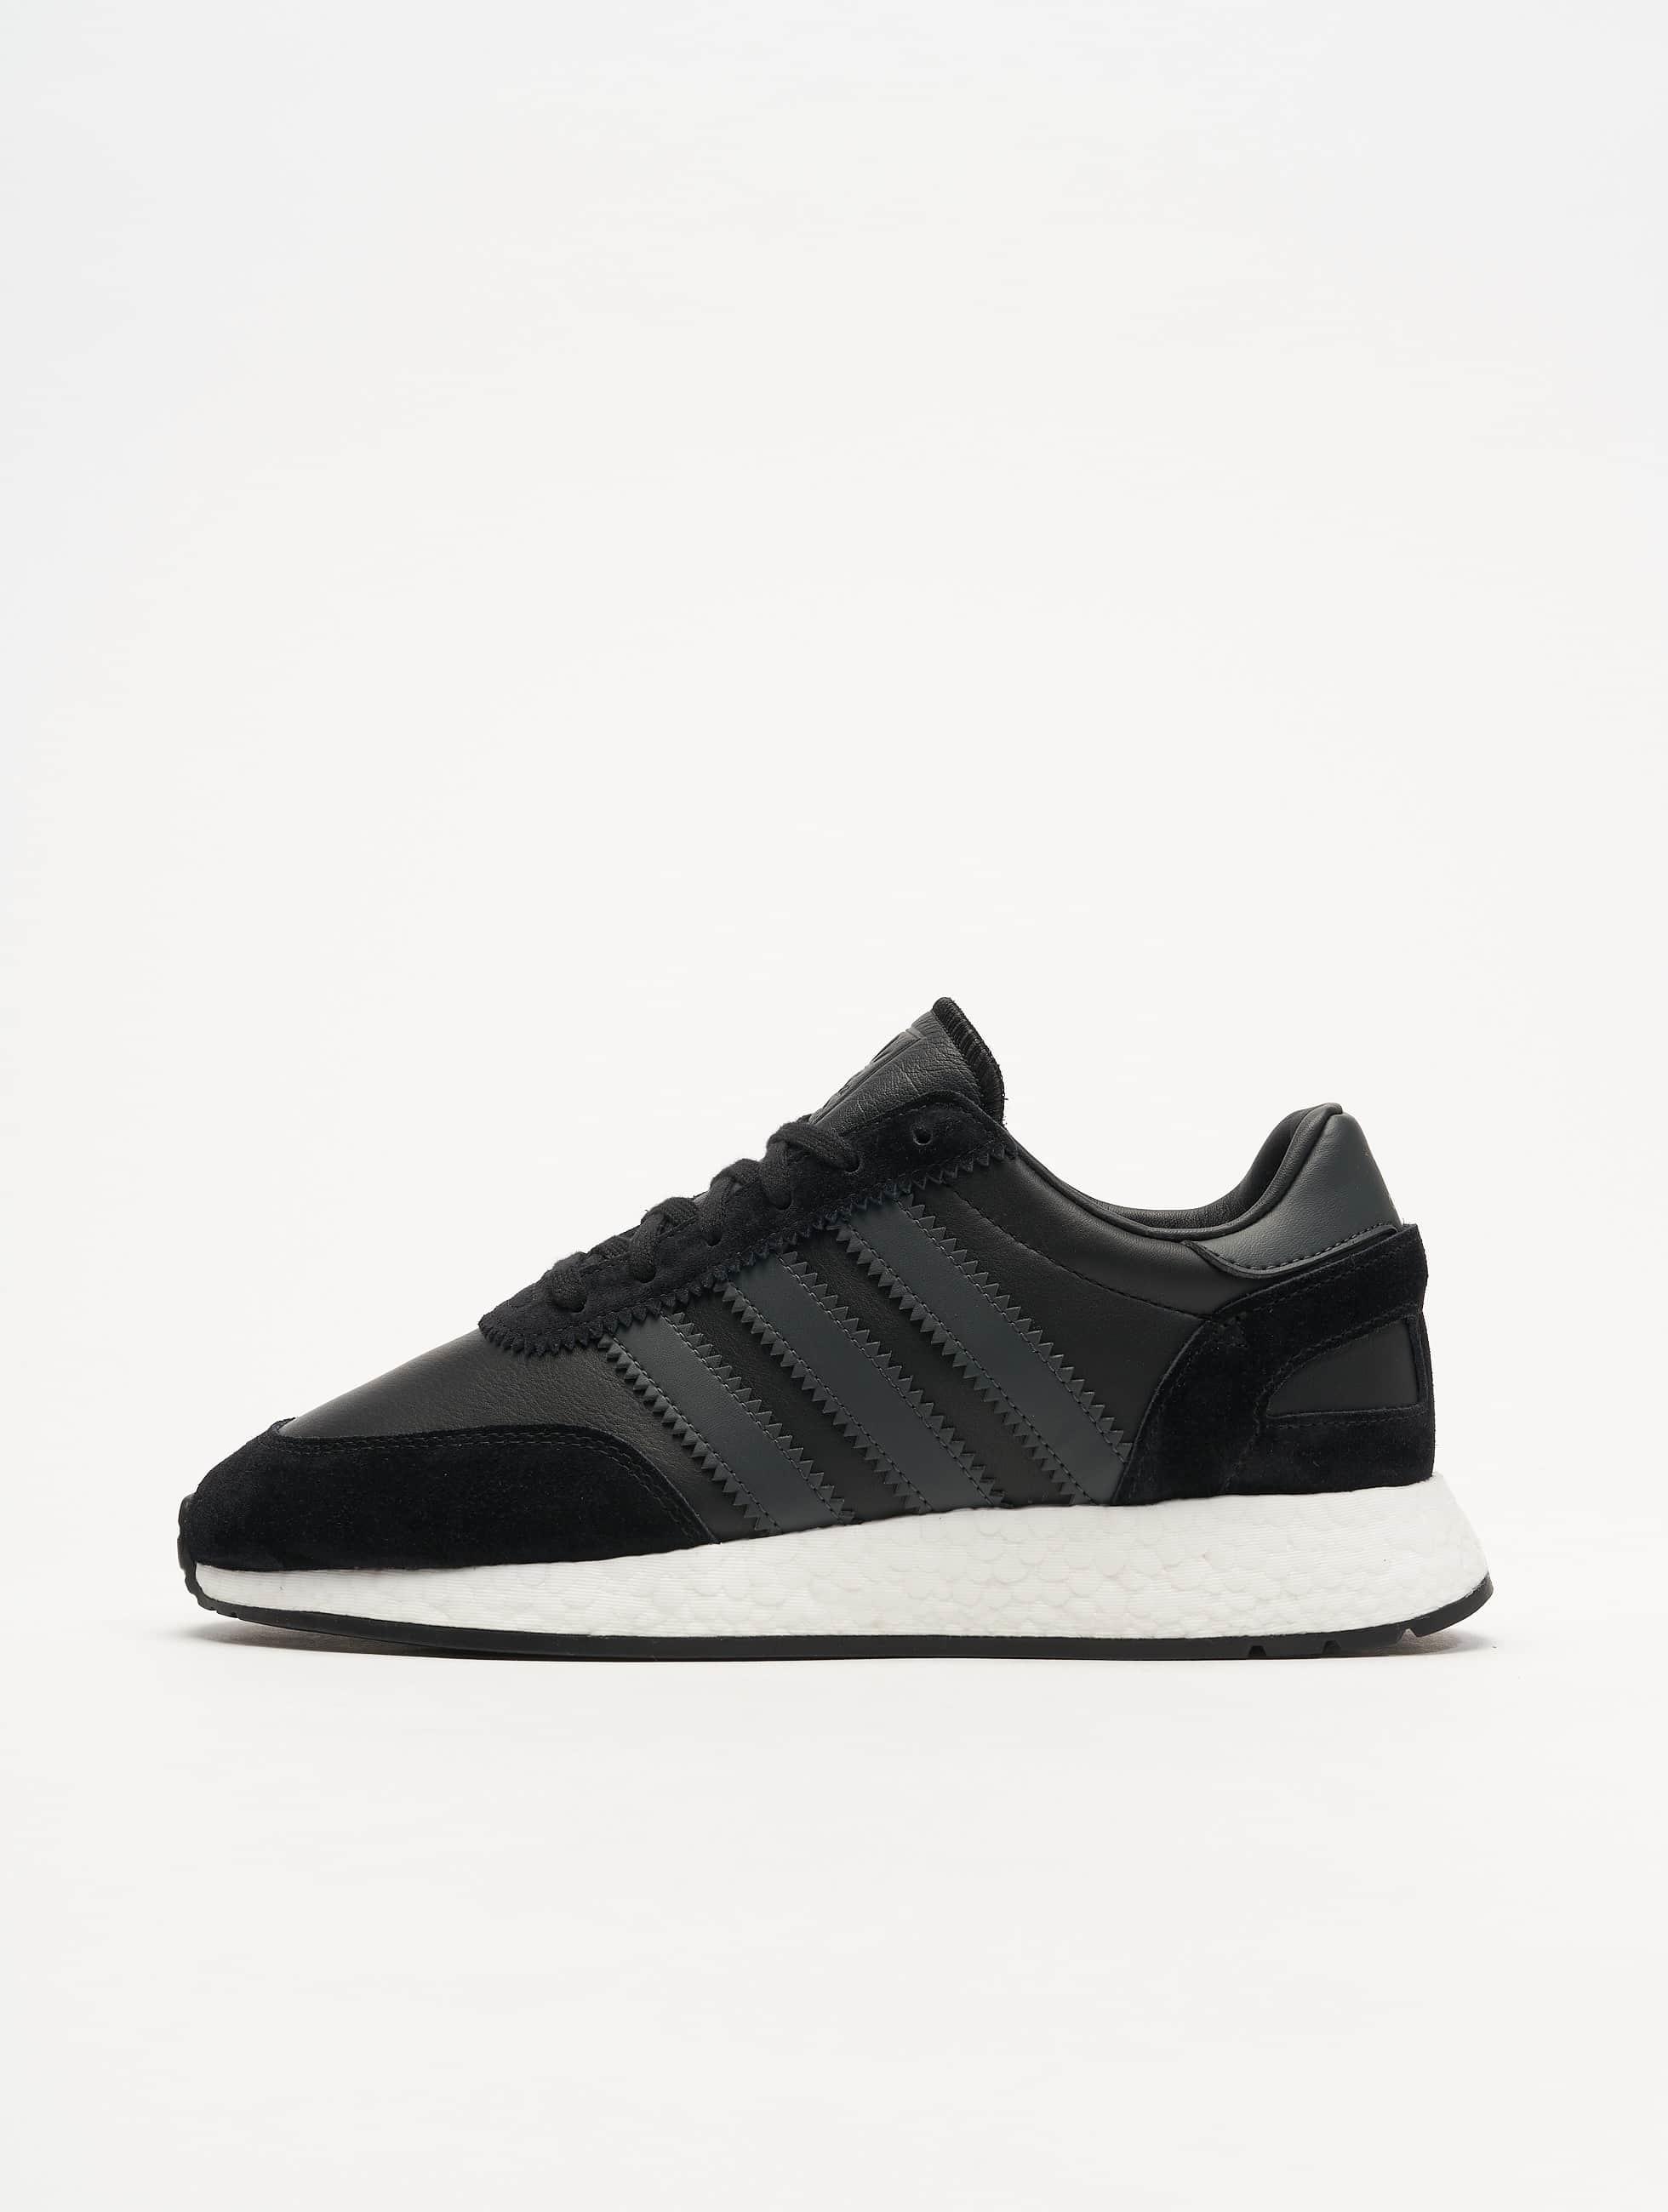 4bcf95f5cb7 adidas originals schoen / sneaker I-5923 in zwart 543383